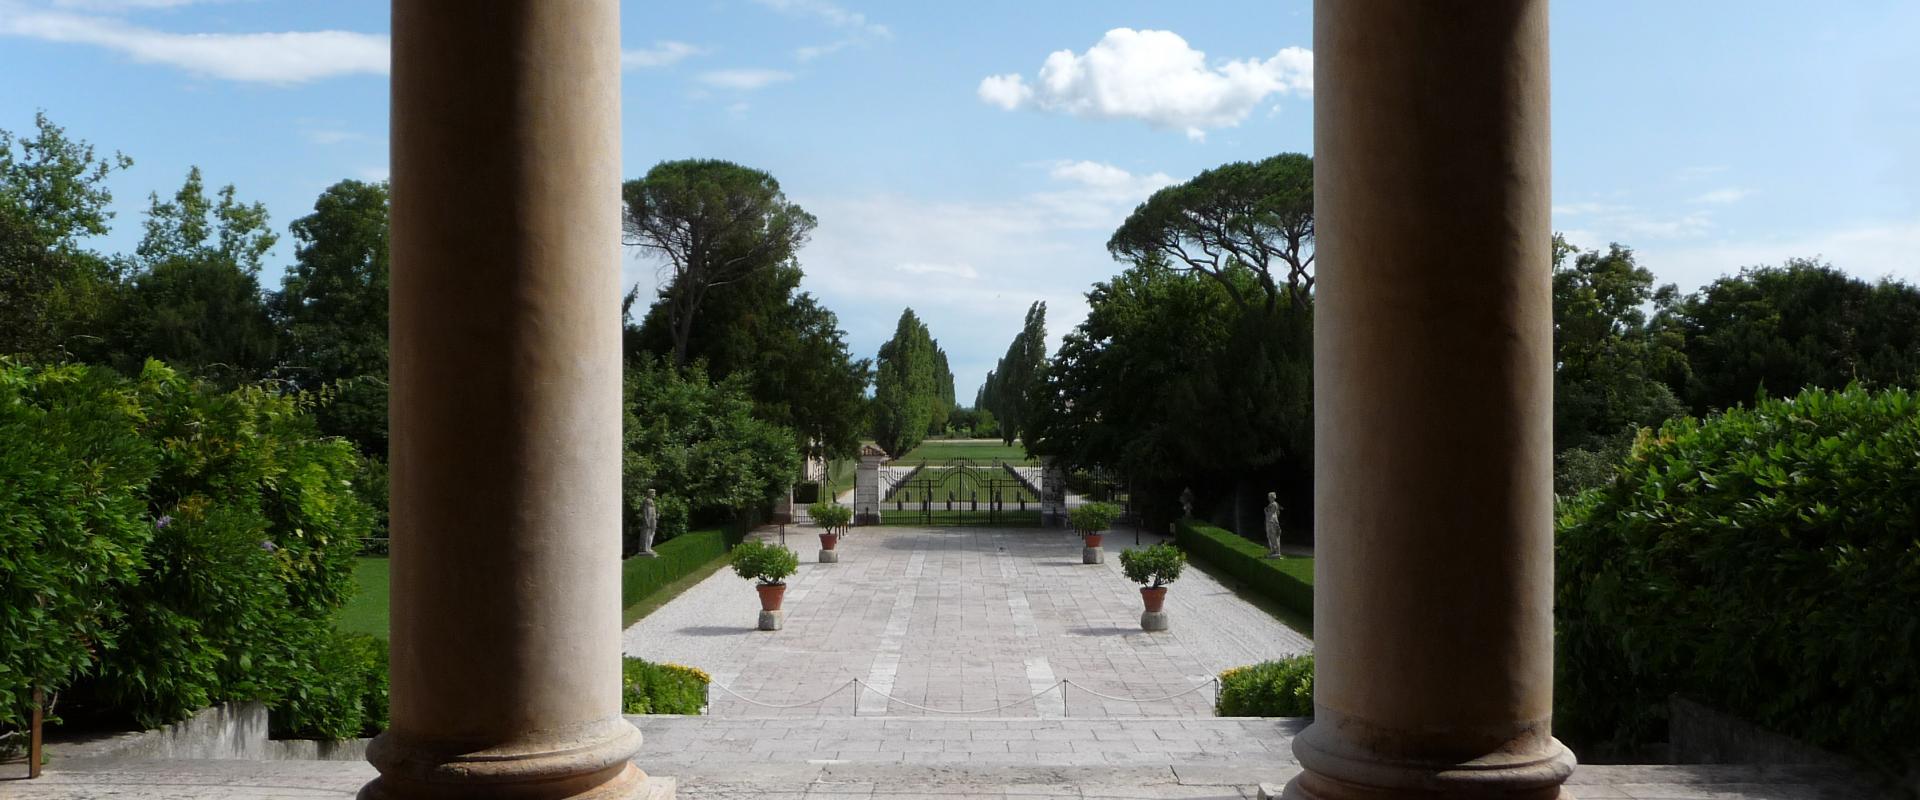 Villa Emo loggia